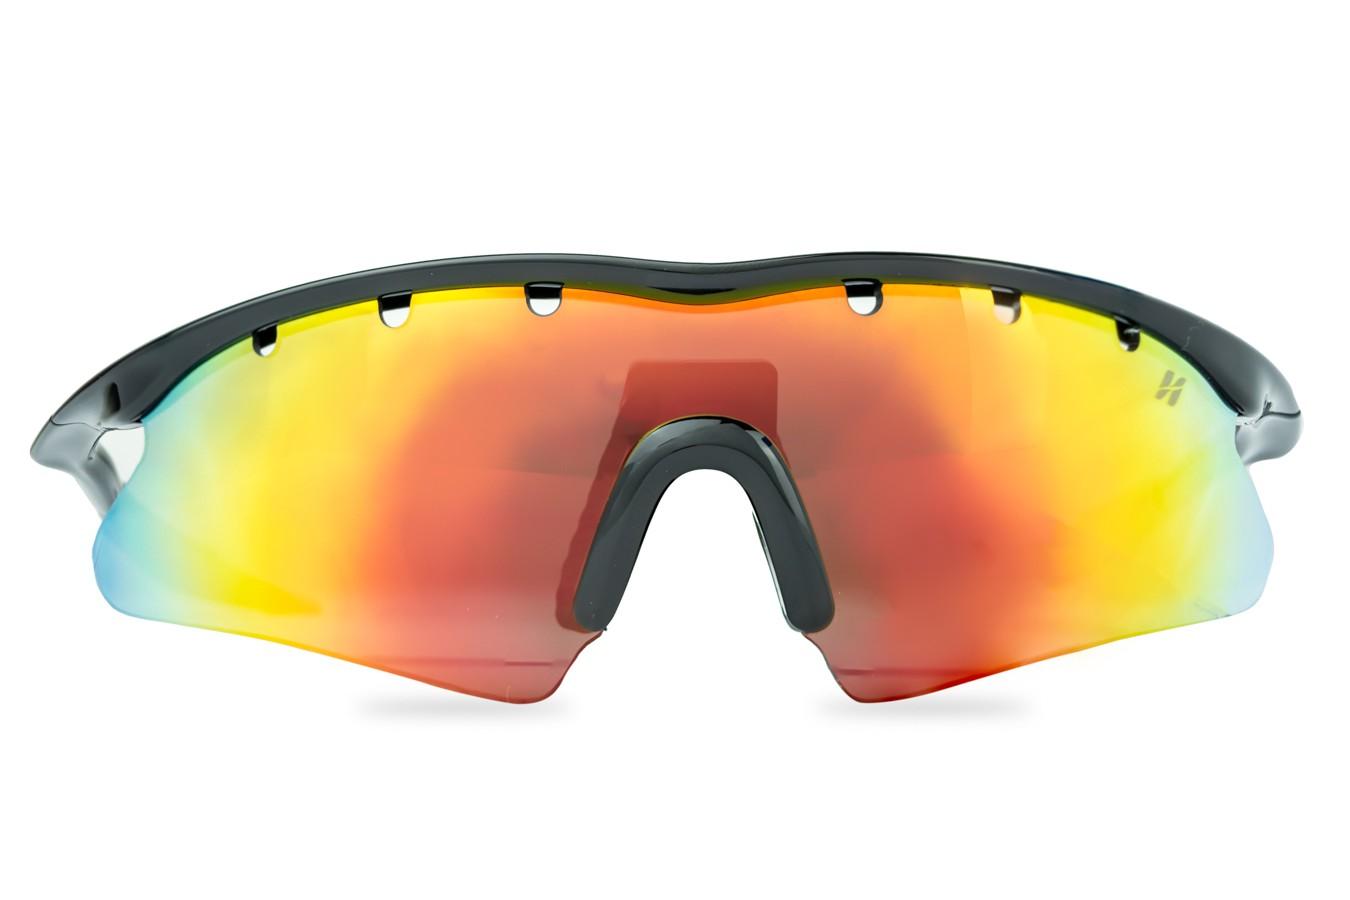 Óculos Ciclista 3 lentes Fusion - High One